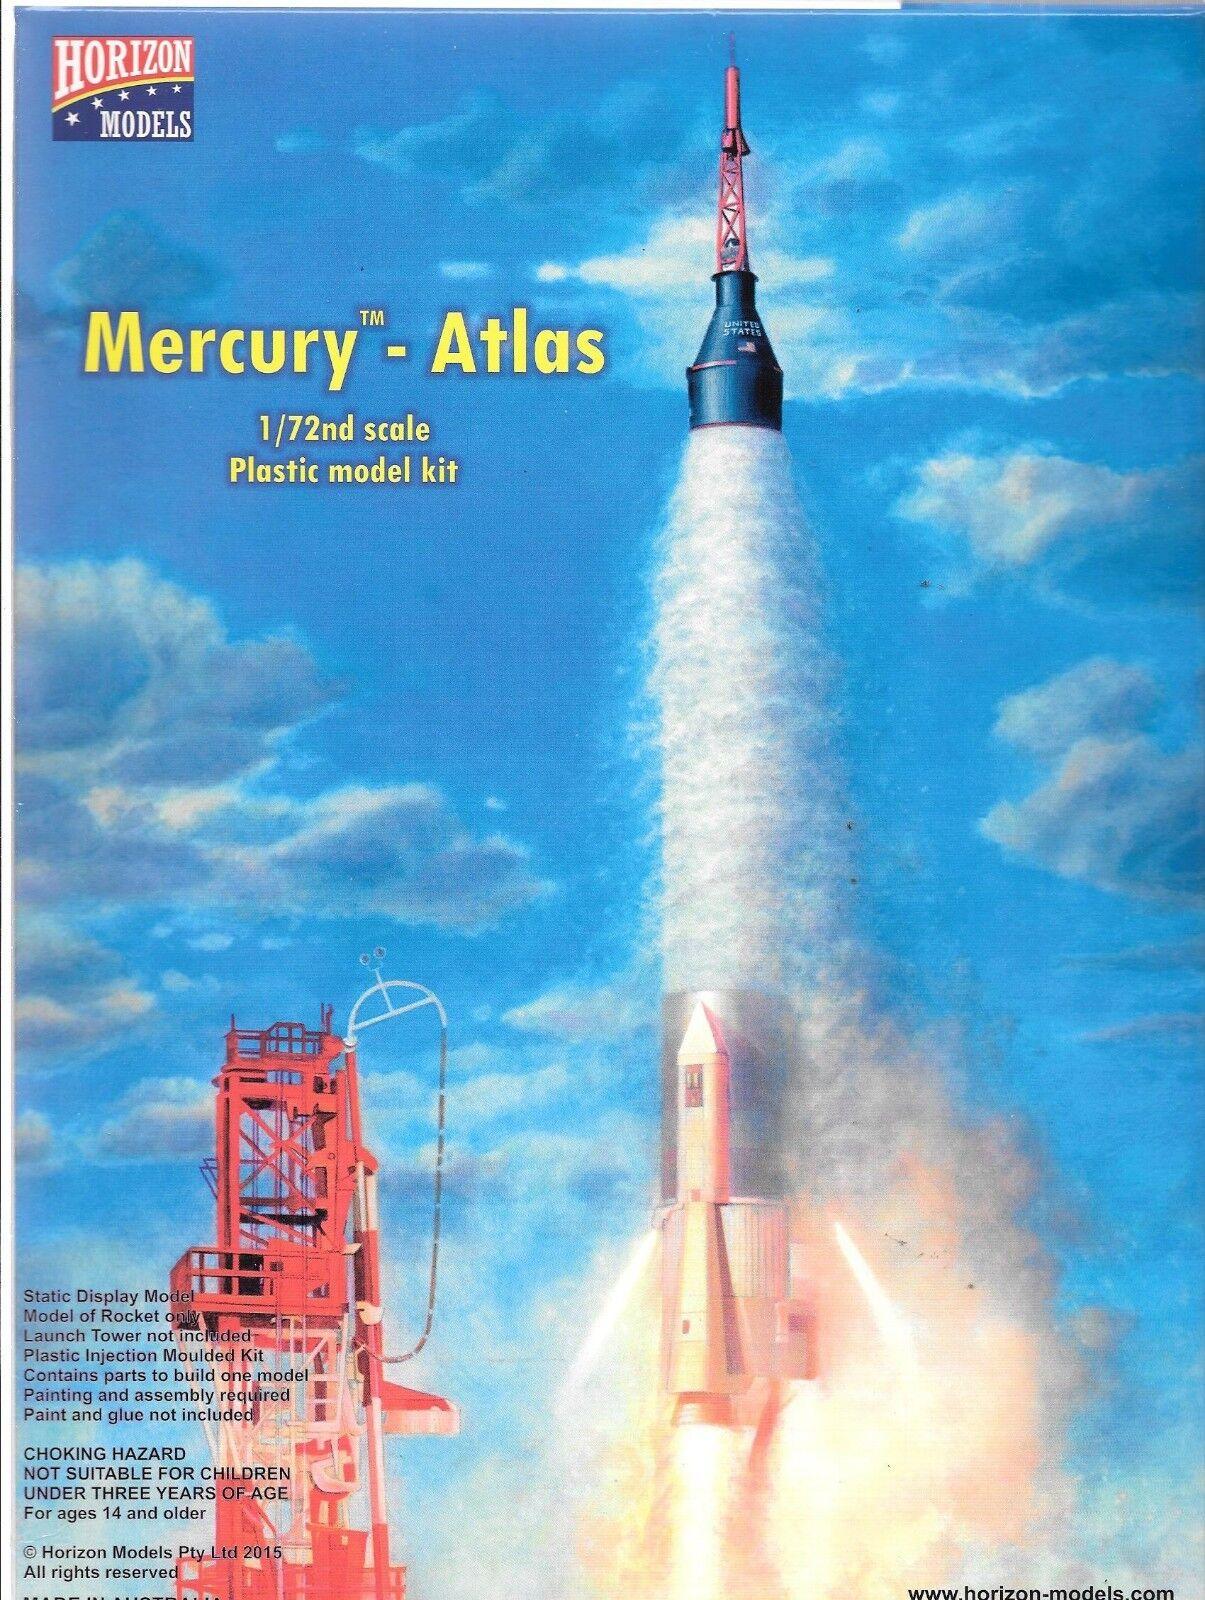 contador genuino Horizon Models Mercurio - Atlas, Cohete & & & Cápsula en 1 72 2002 St  precios mas bajos